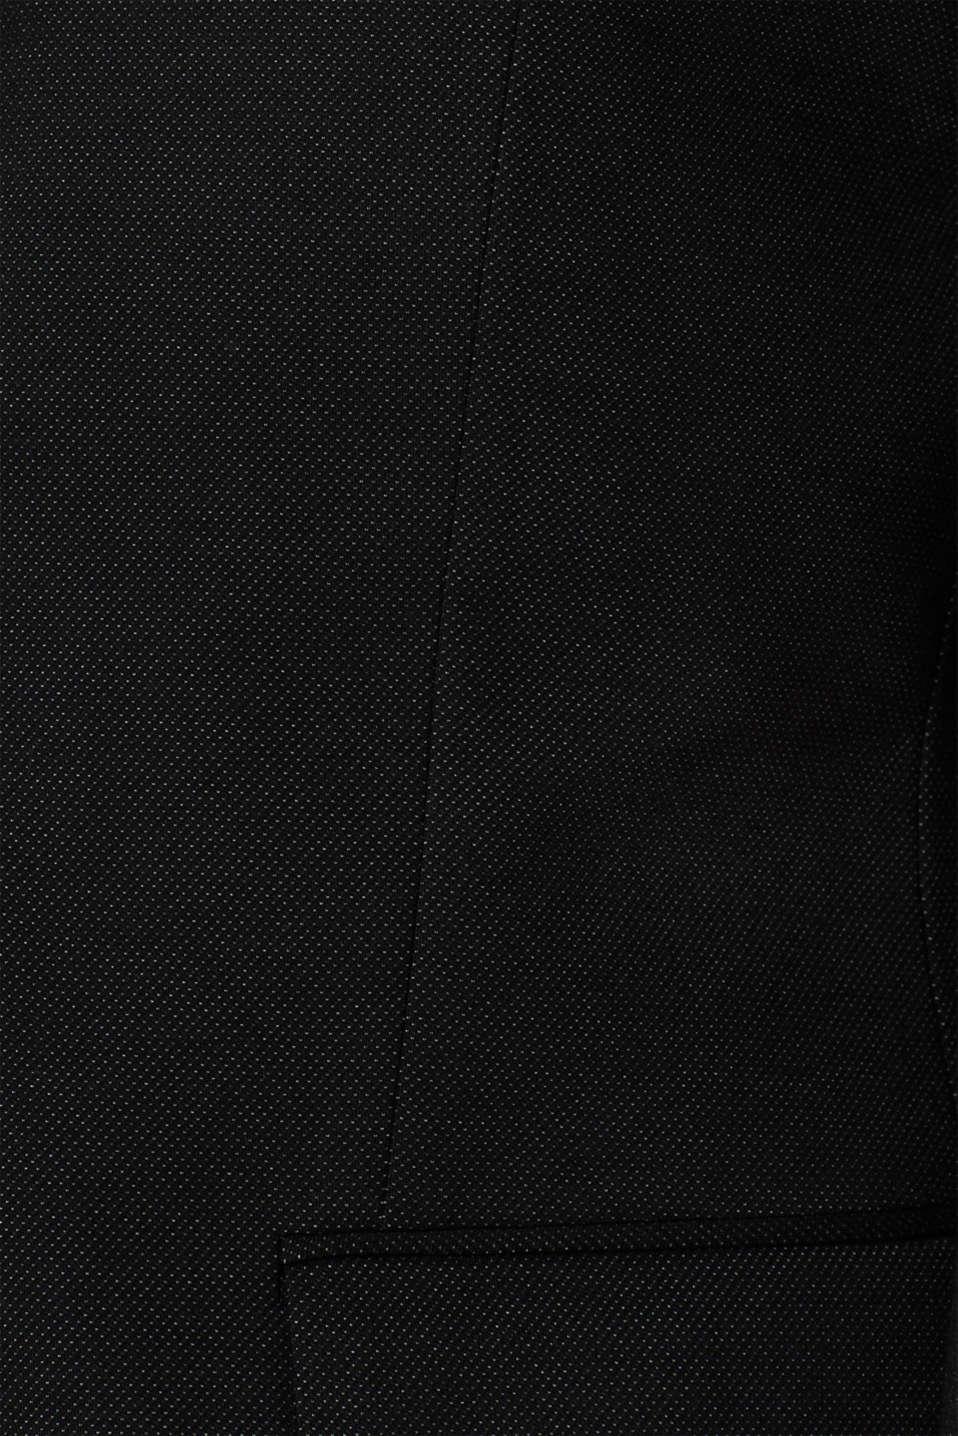 Blazers suit, BLACK, detail image number 4